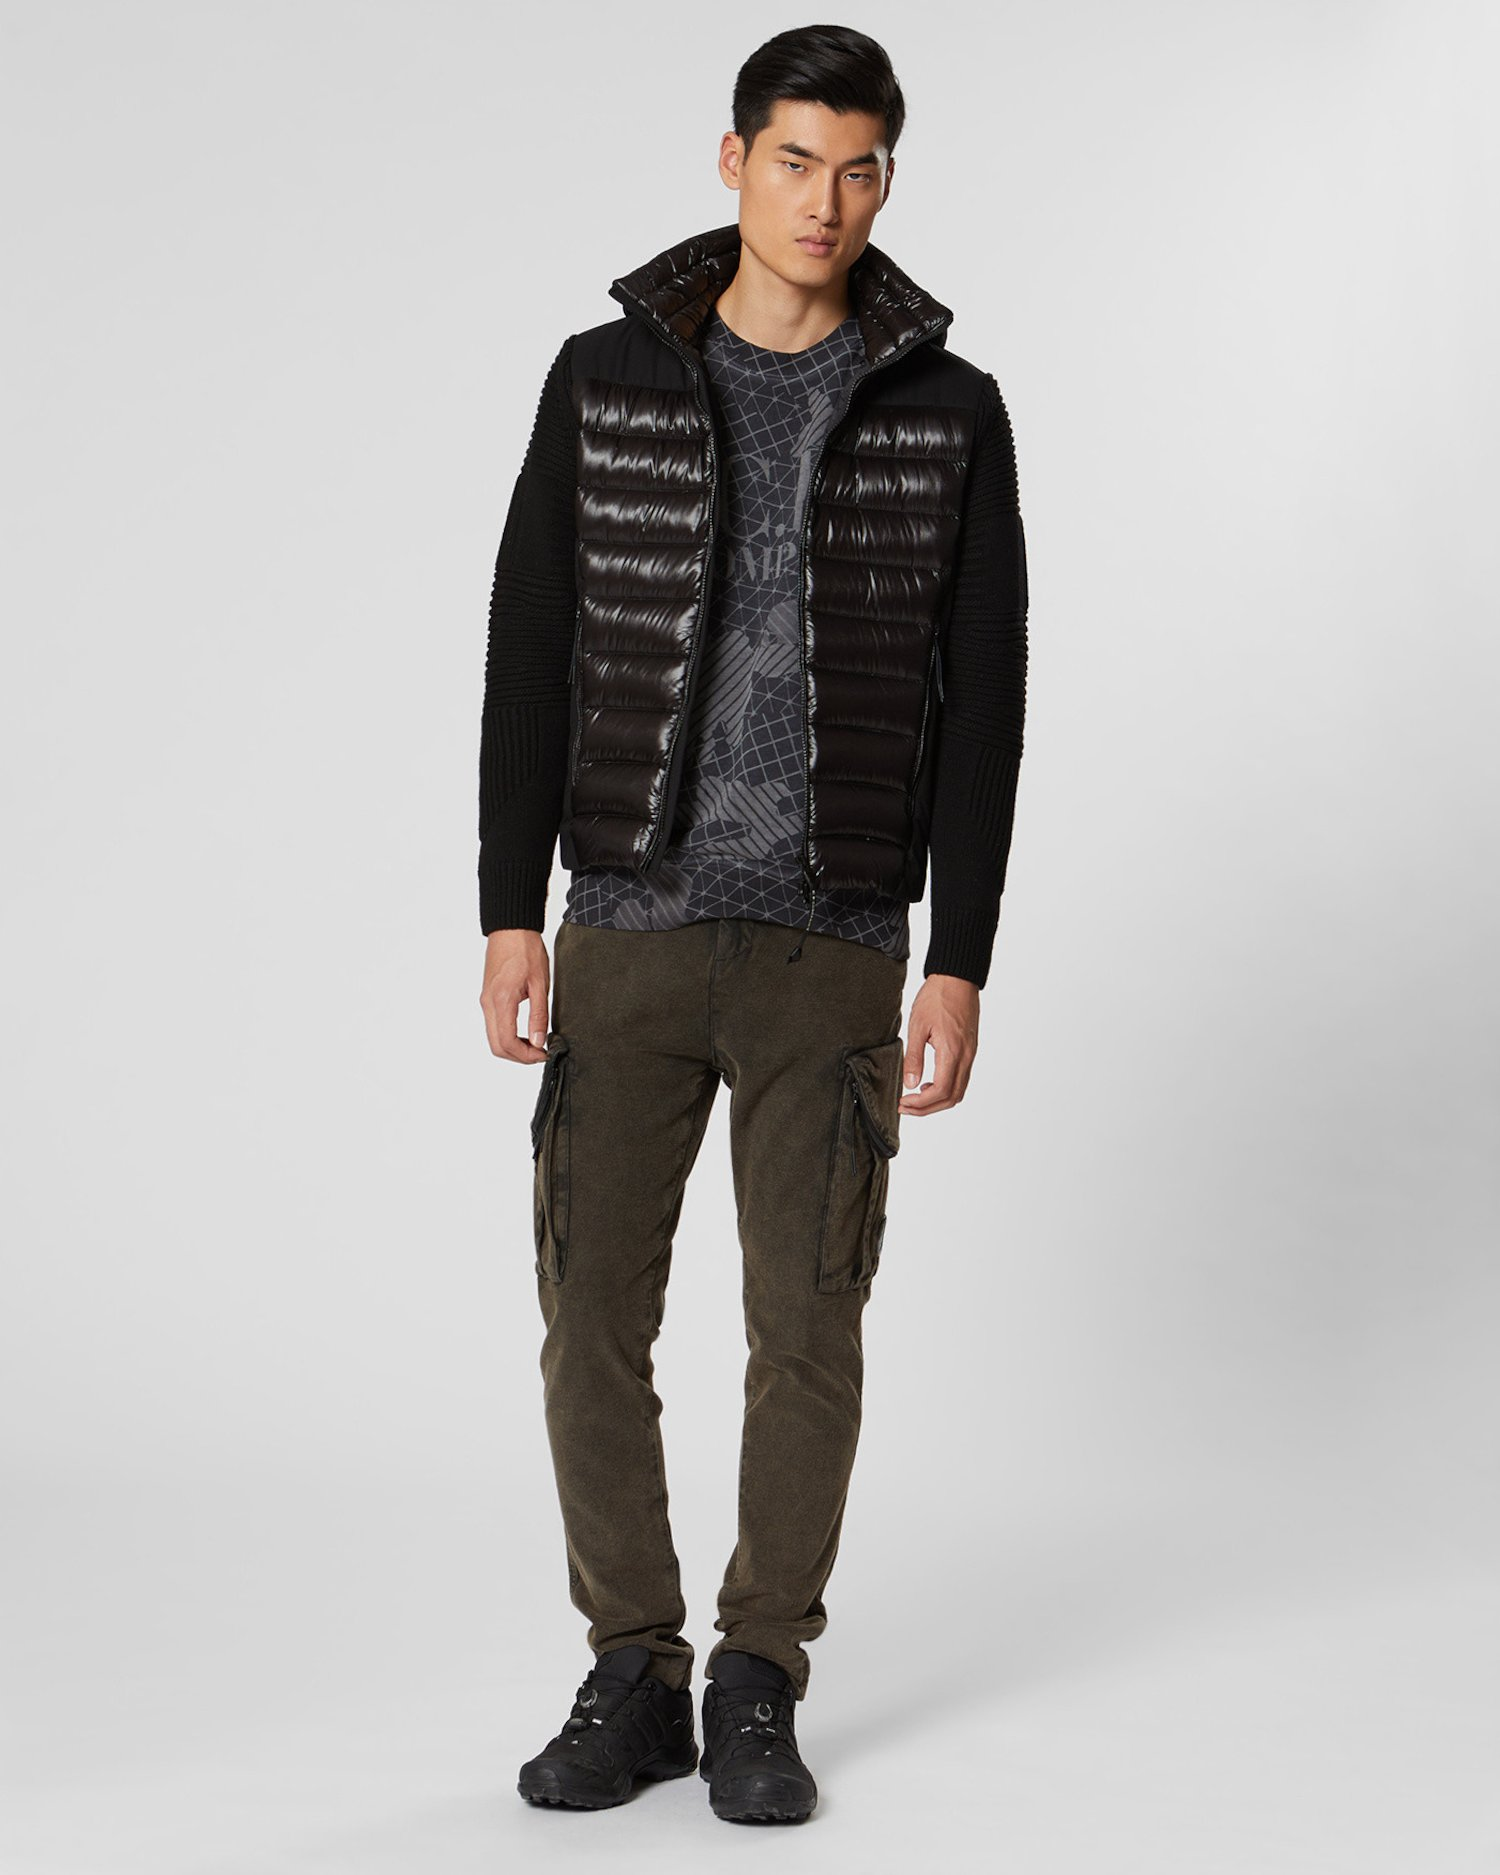 Lambswool / nylon Panelled Knit Goggle Jacket